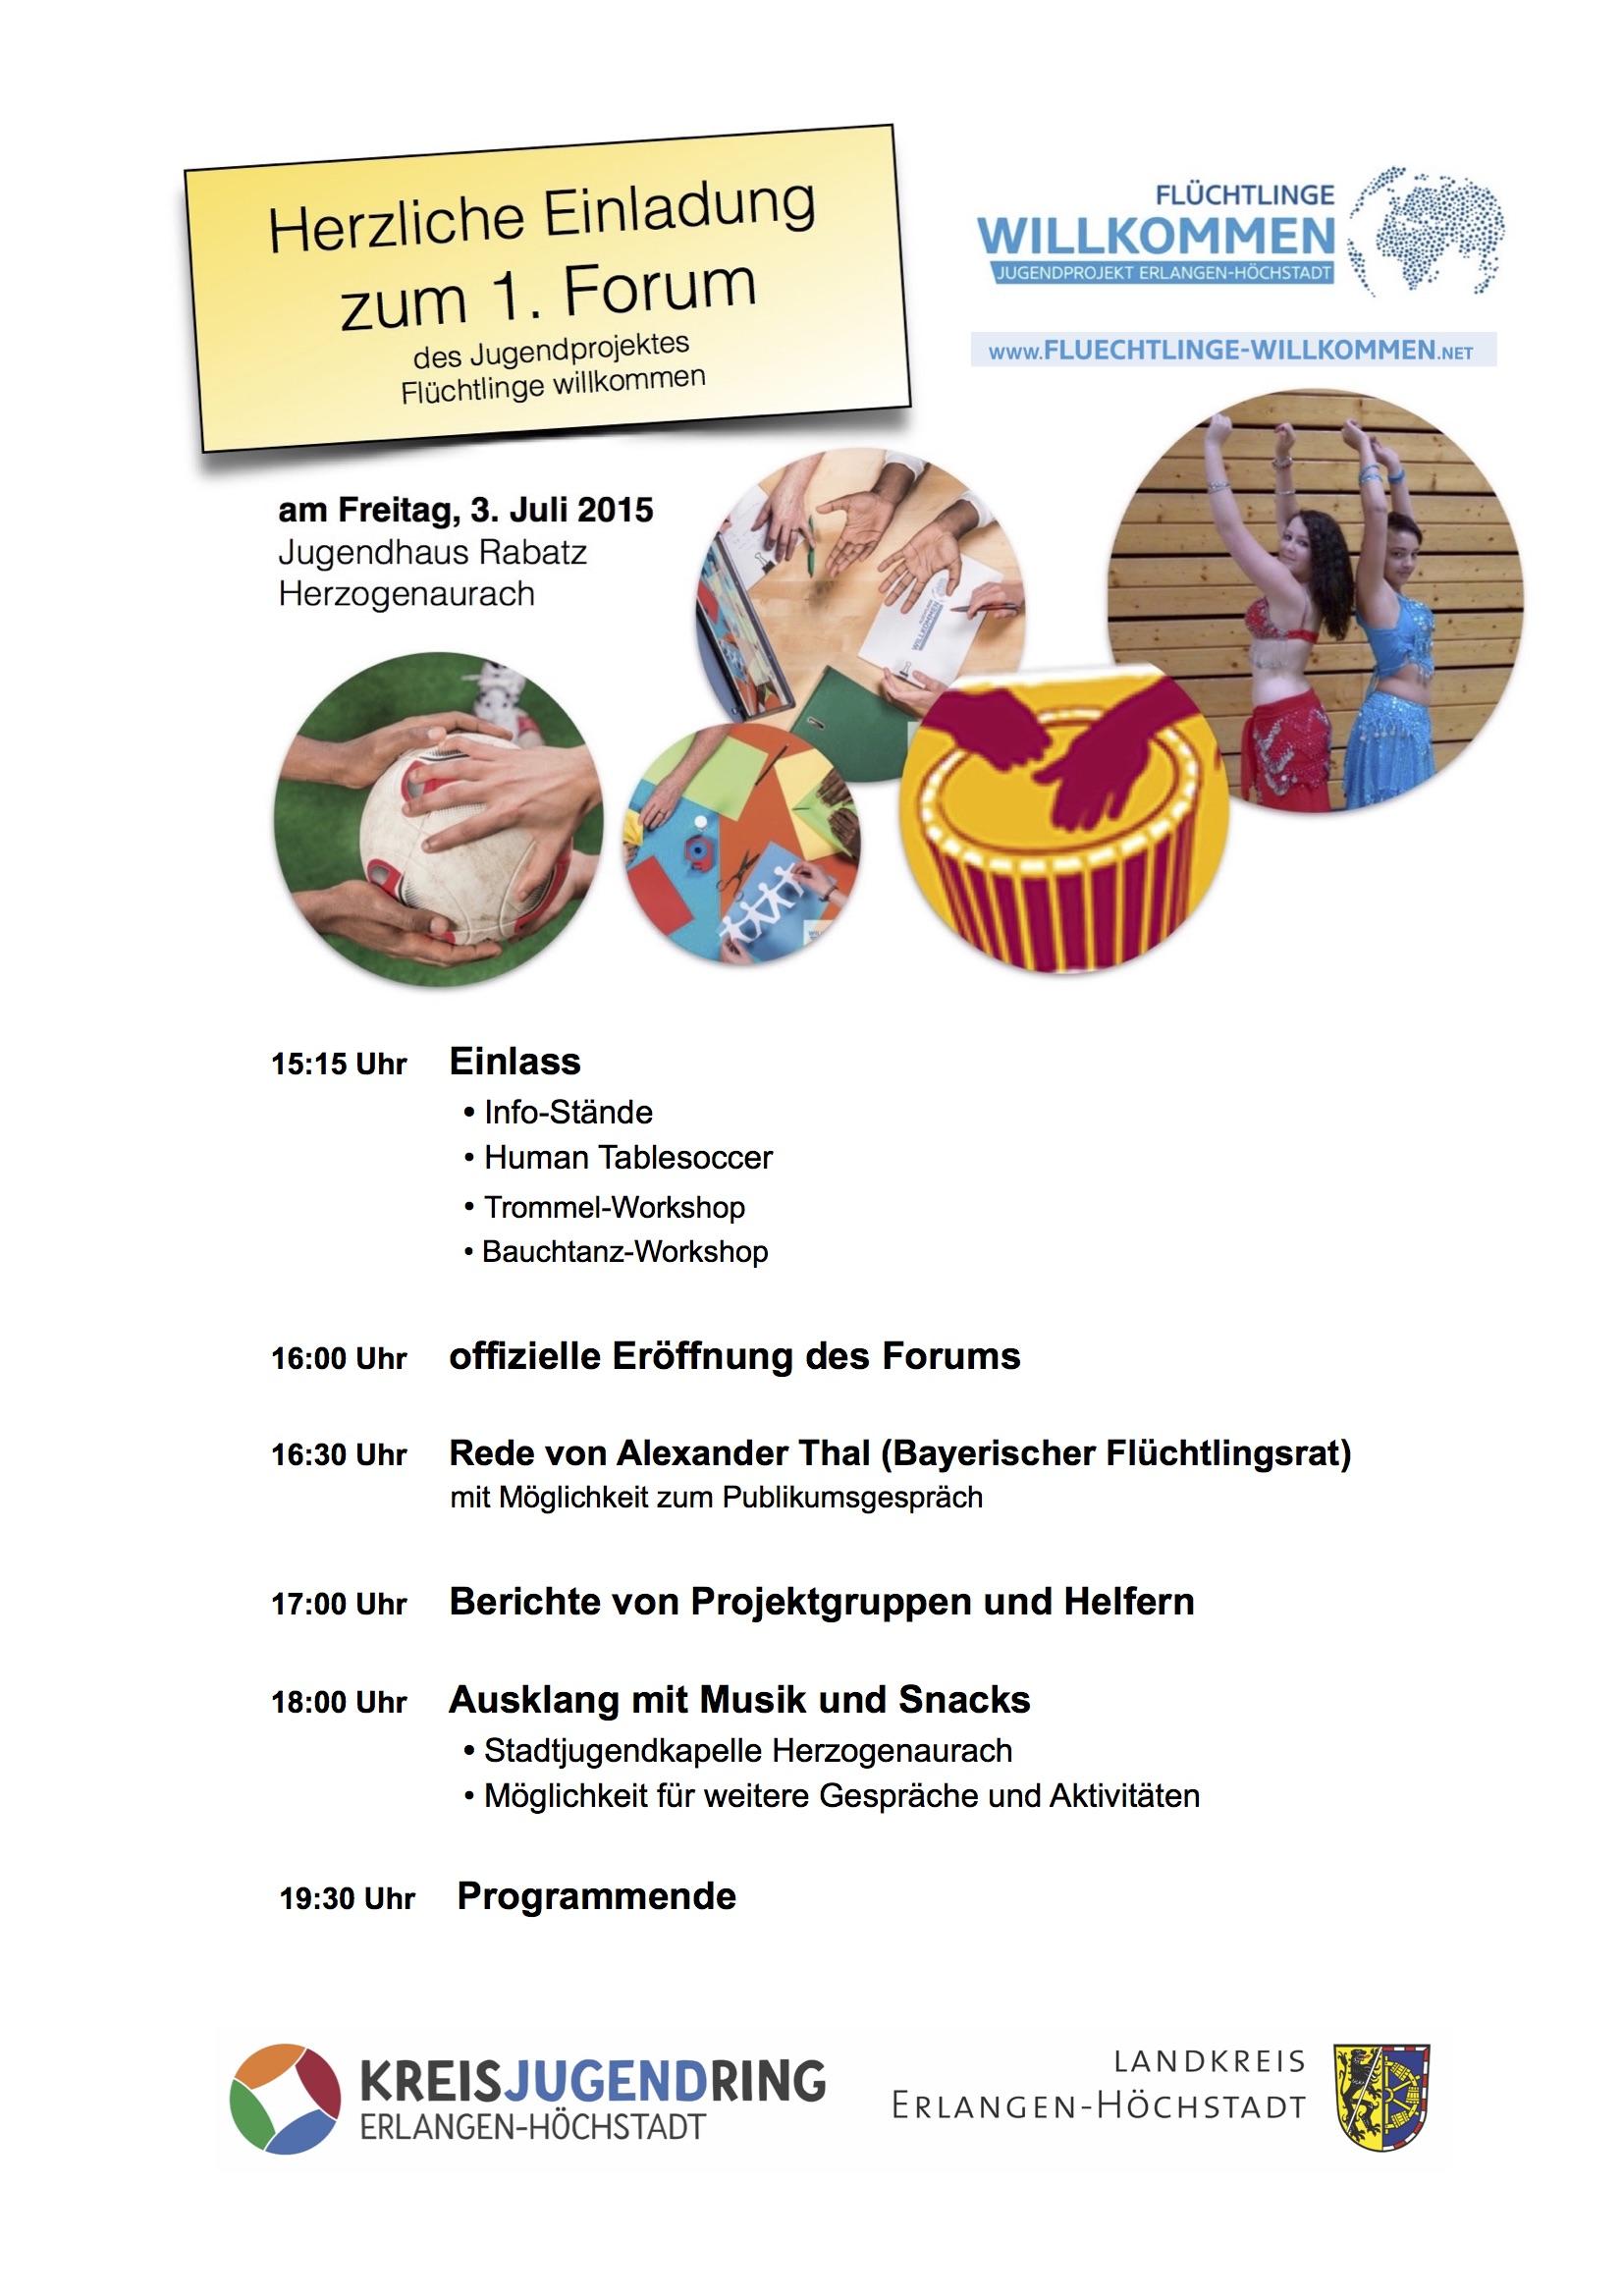 Programm-1.-Forum-JP-Flüchtlinge-willkommen-extern4